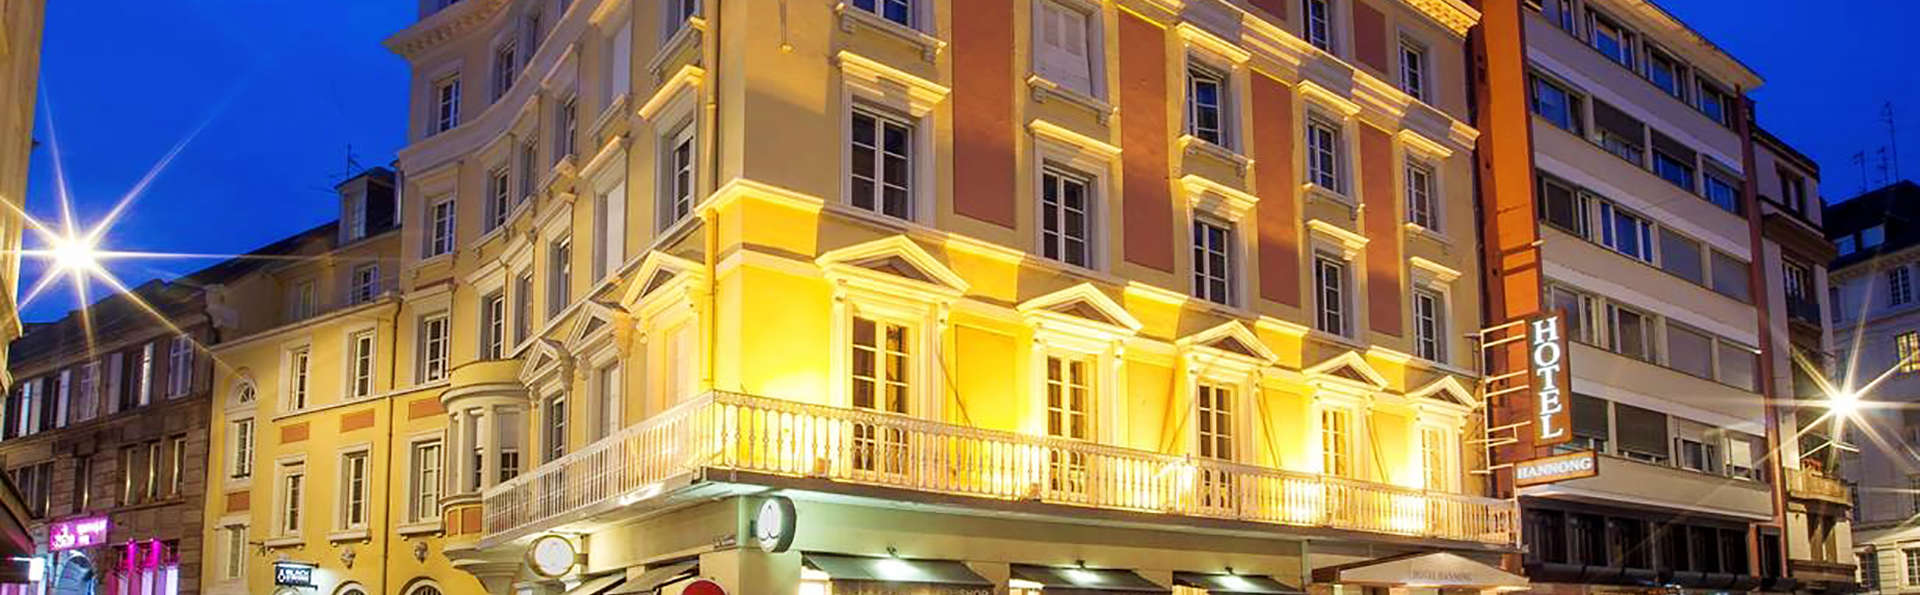 Hôtel Hannong - EDIT_Fachada_1.jpg